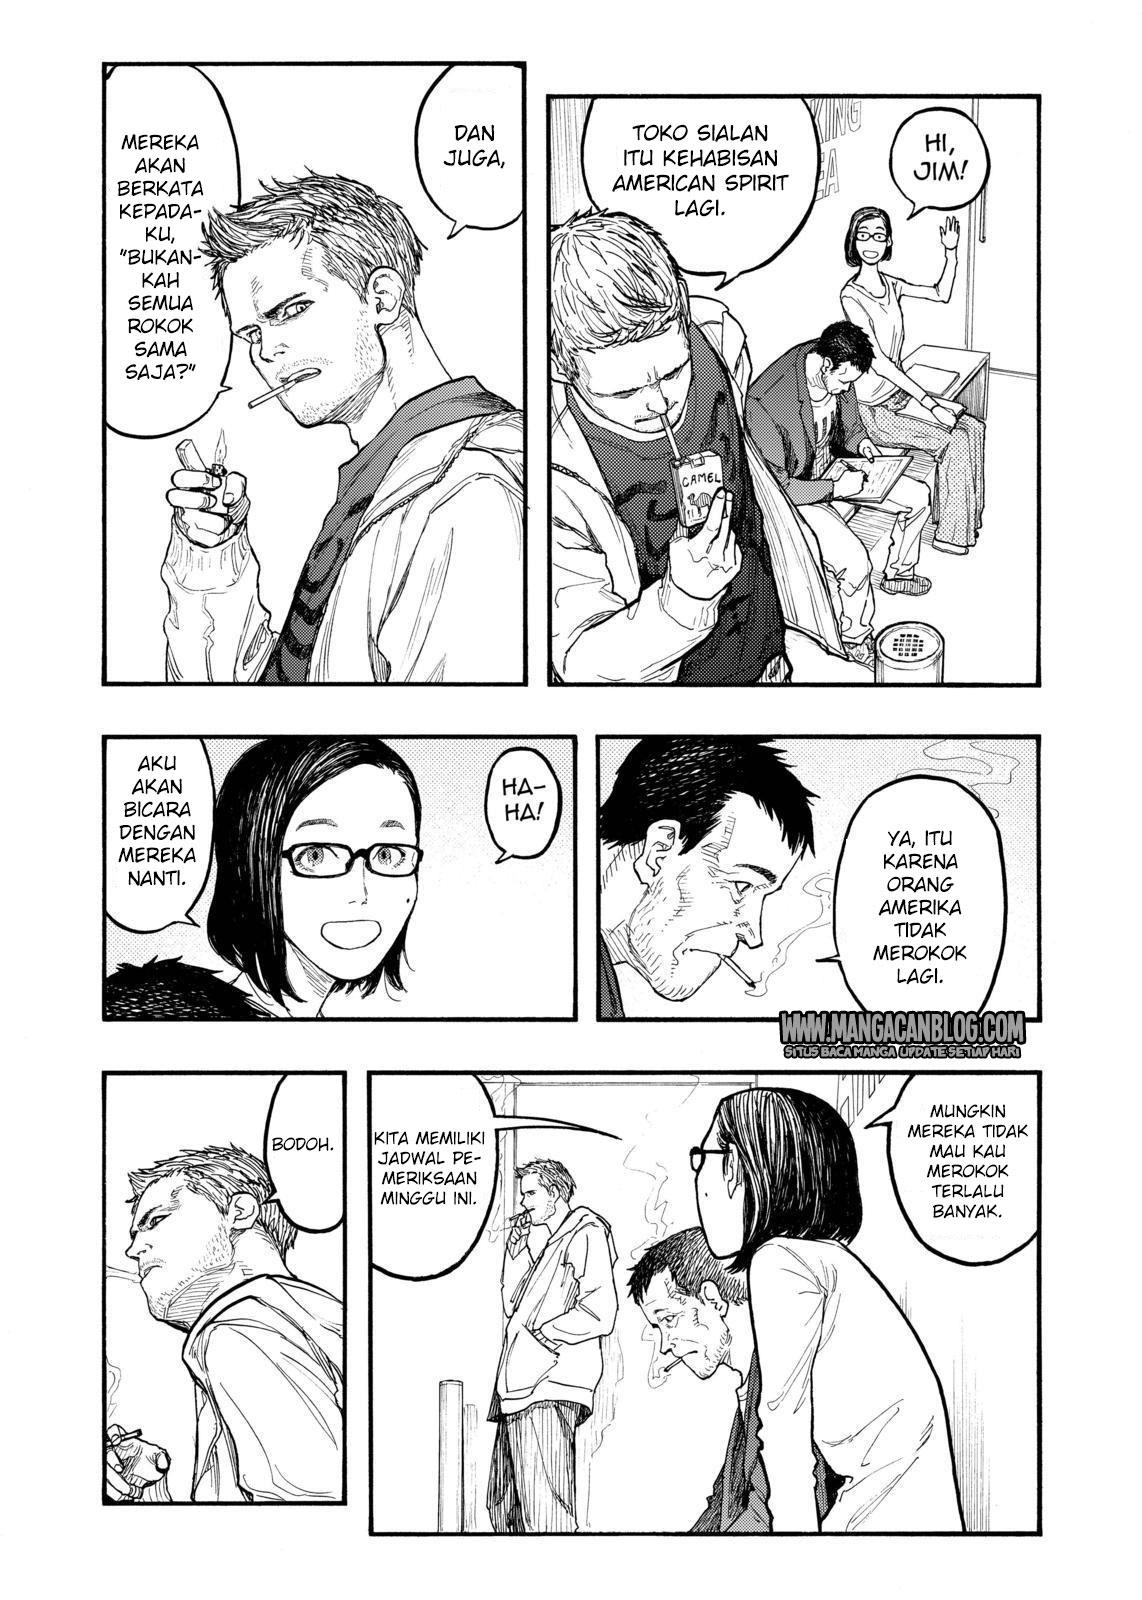 Dilarang COPAS - situs resmi www.mangacanblog.com - Komik ajin 046 - selamat pagi, sampai jumpa besok 47 Indonesia ajin 046 - selamat pagi, sampai jumpa besok Terbaru 15|Baca Manga Komik Indonesia|Mangacan